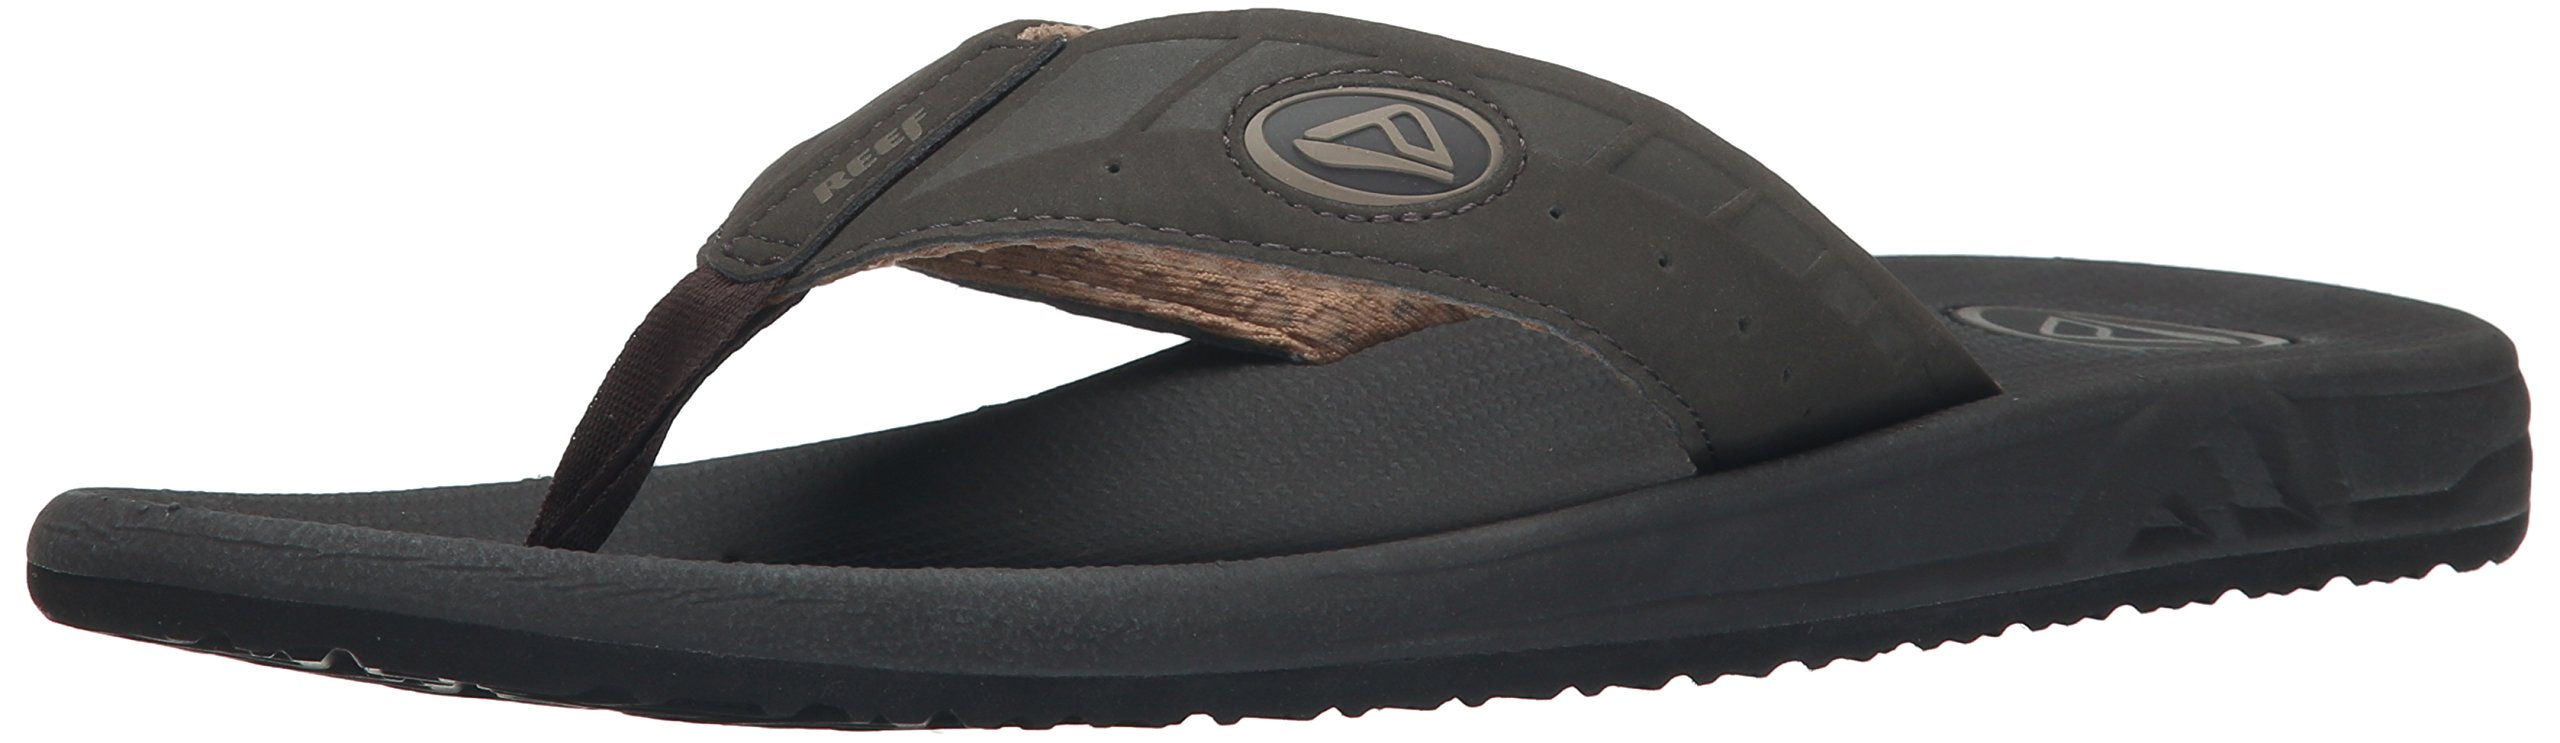 Reef Men's Phantom Sandal, Brown, 11 M US